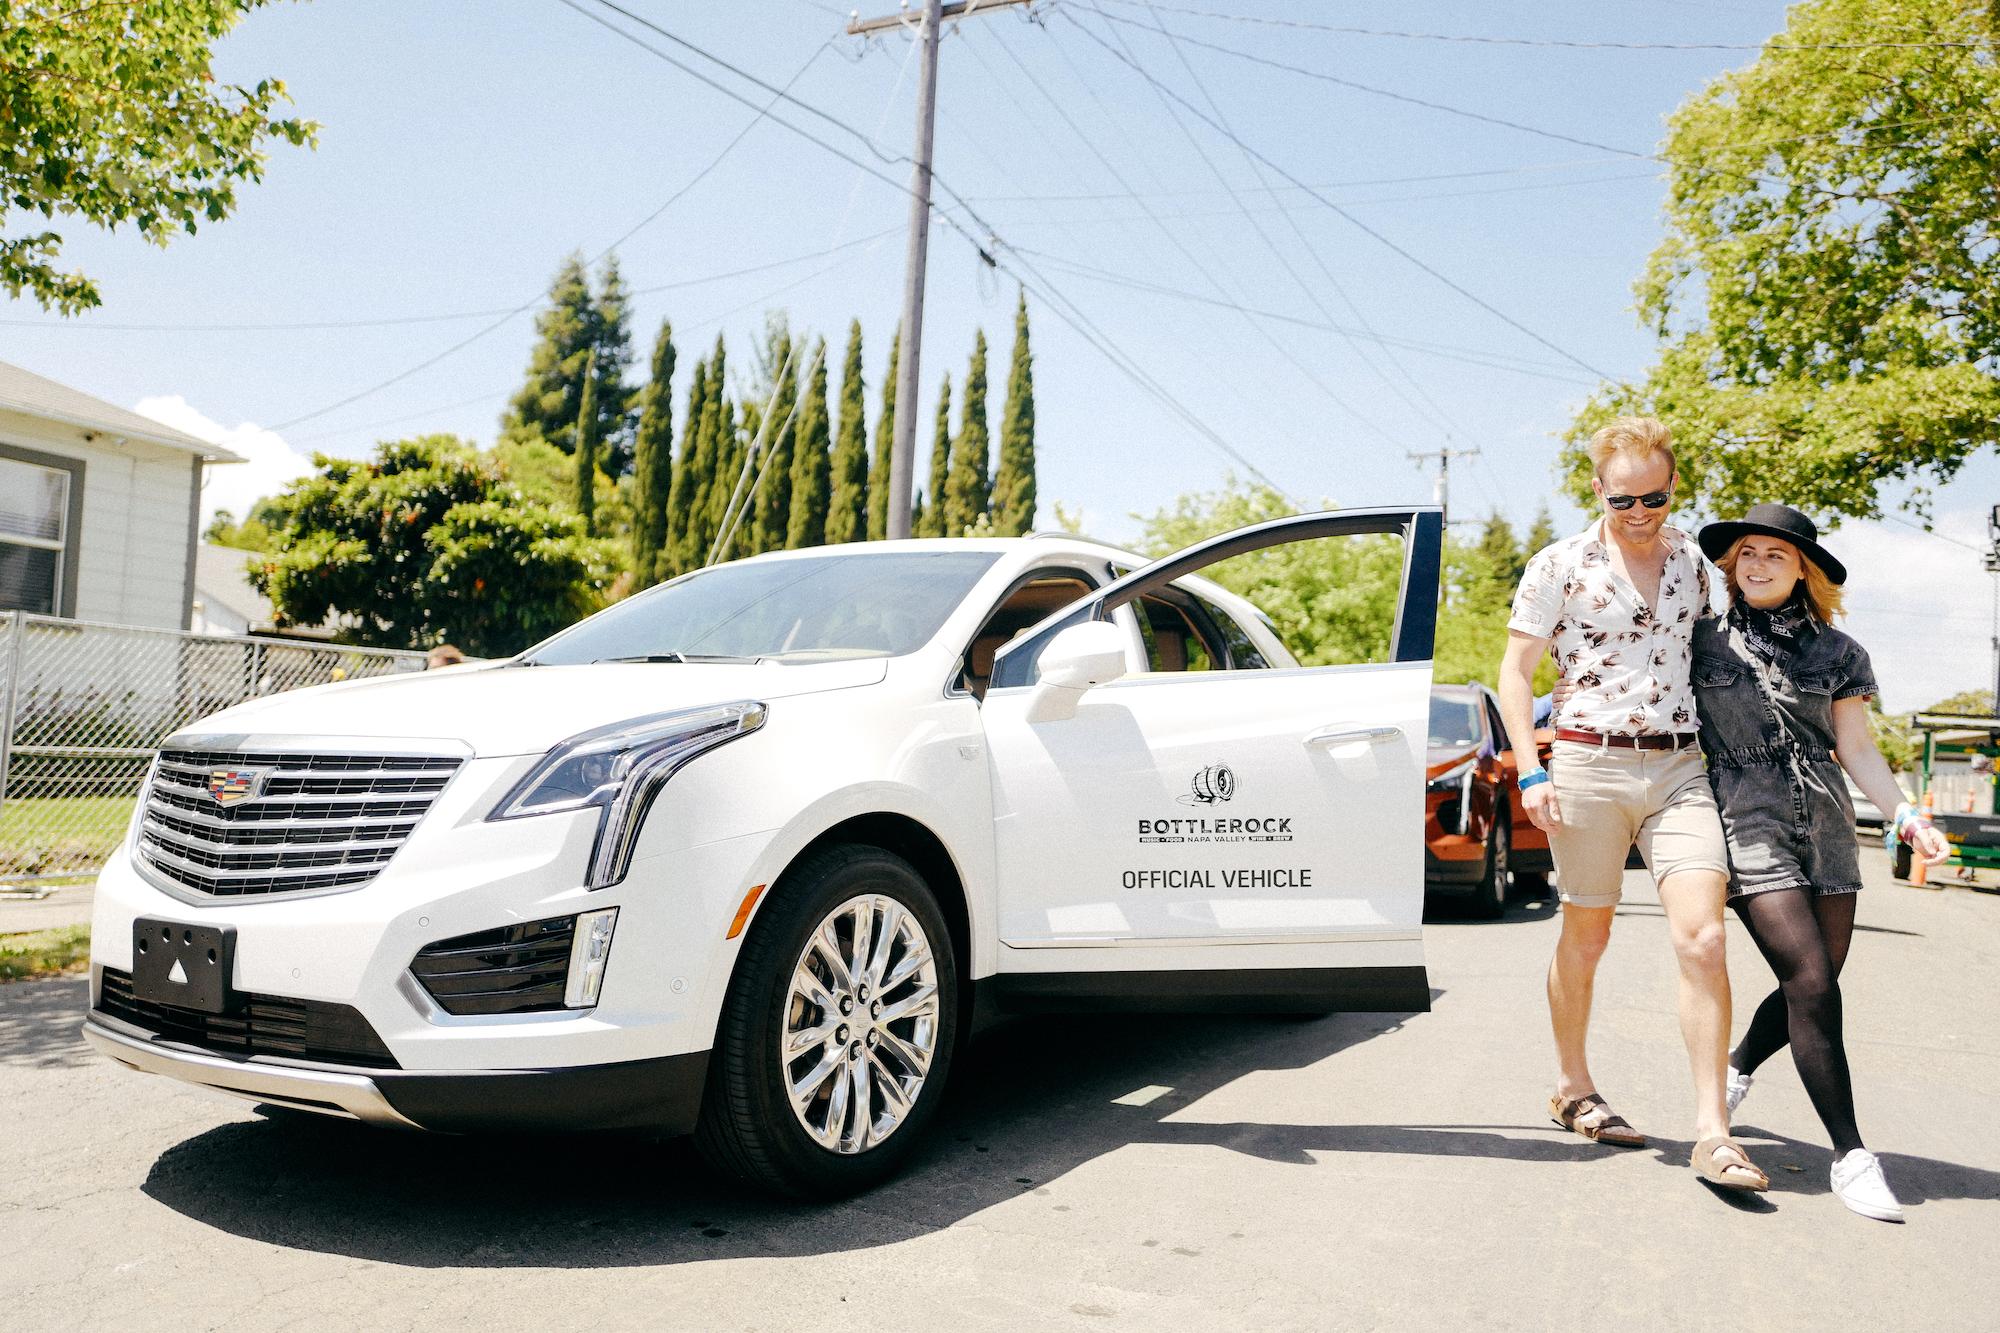 Cadillac @ BottleRock Napa Valley